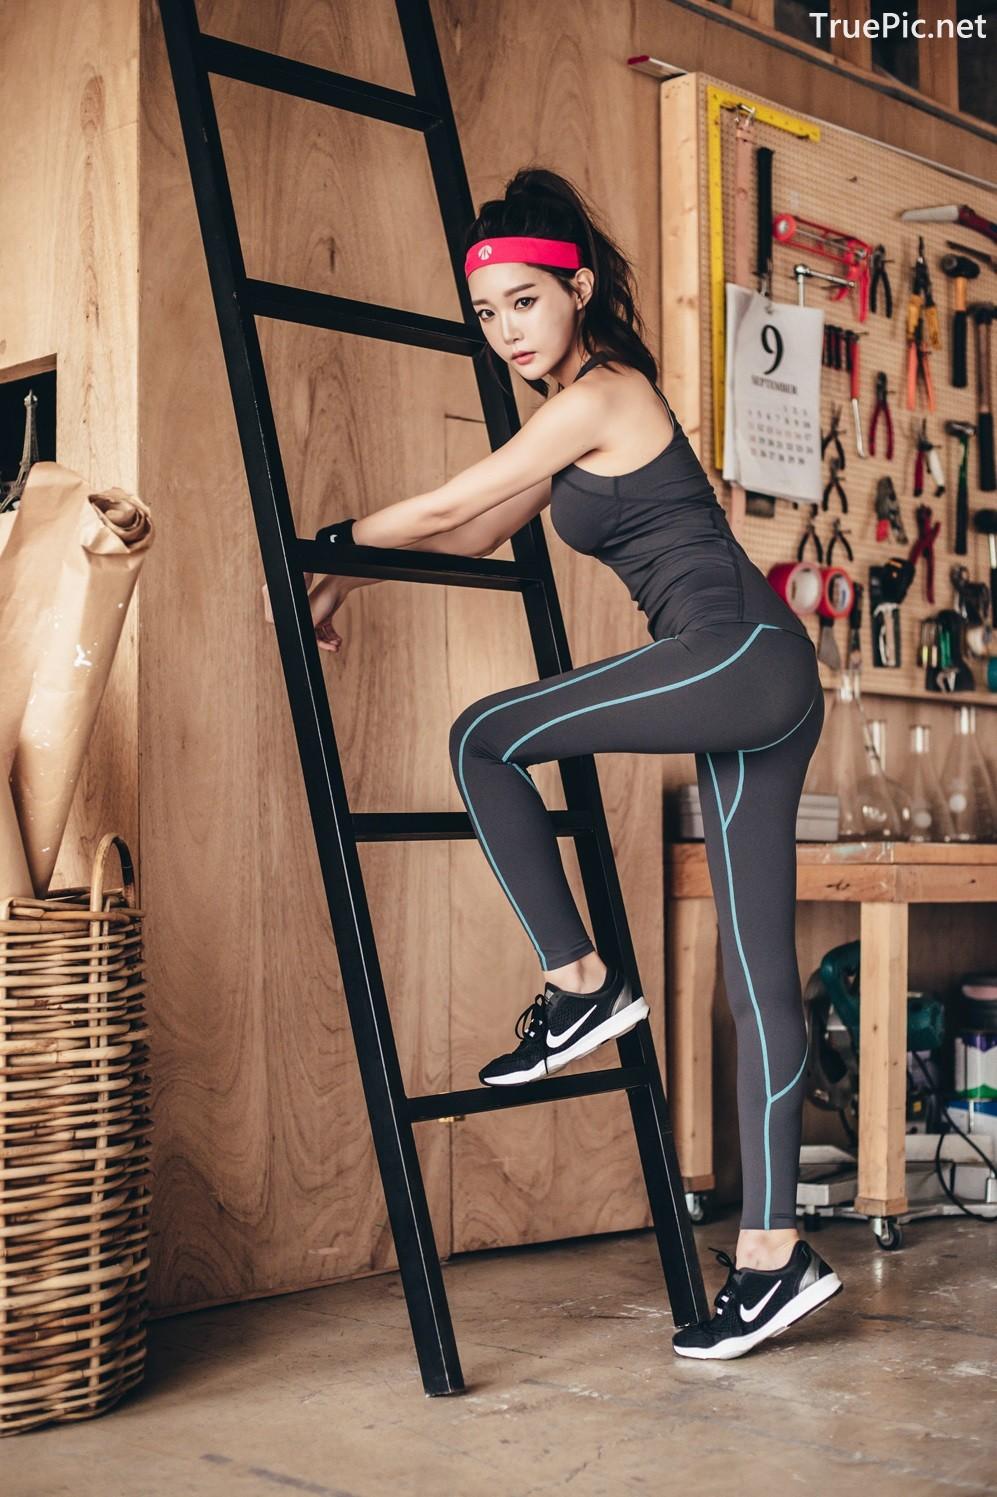 Image Korean Fashion Model - Yoon Ae Ji - Fitness Set Collection - TruePic.net - Picture-4